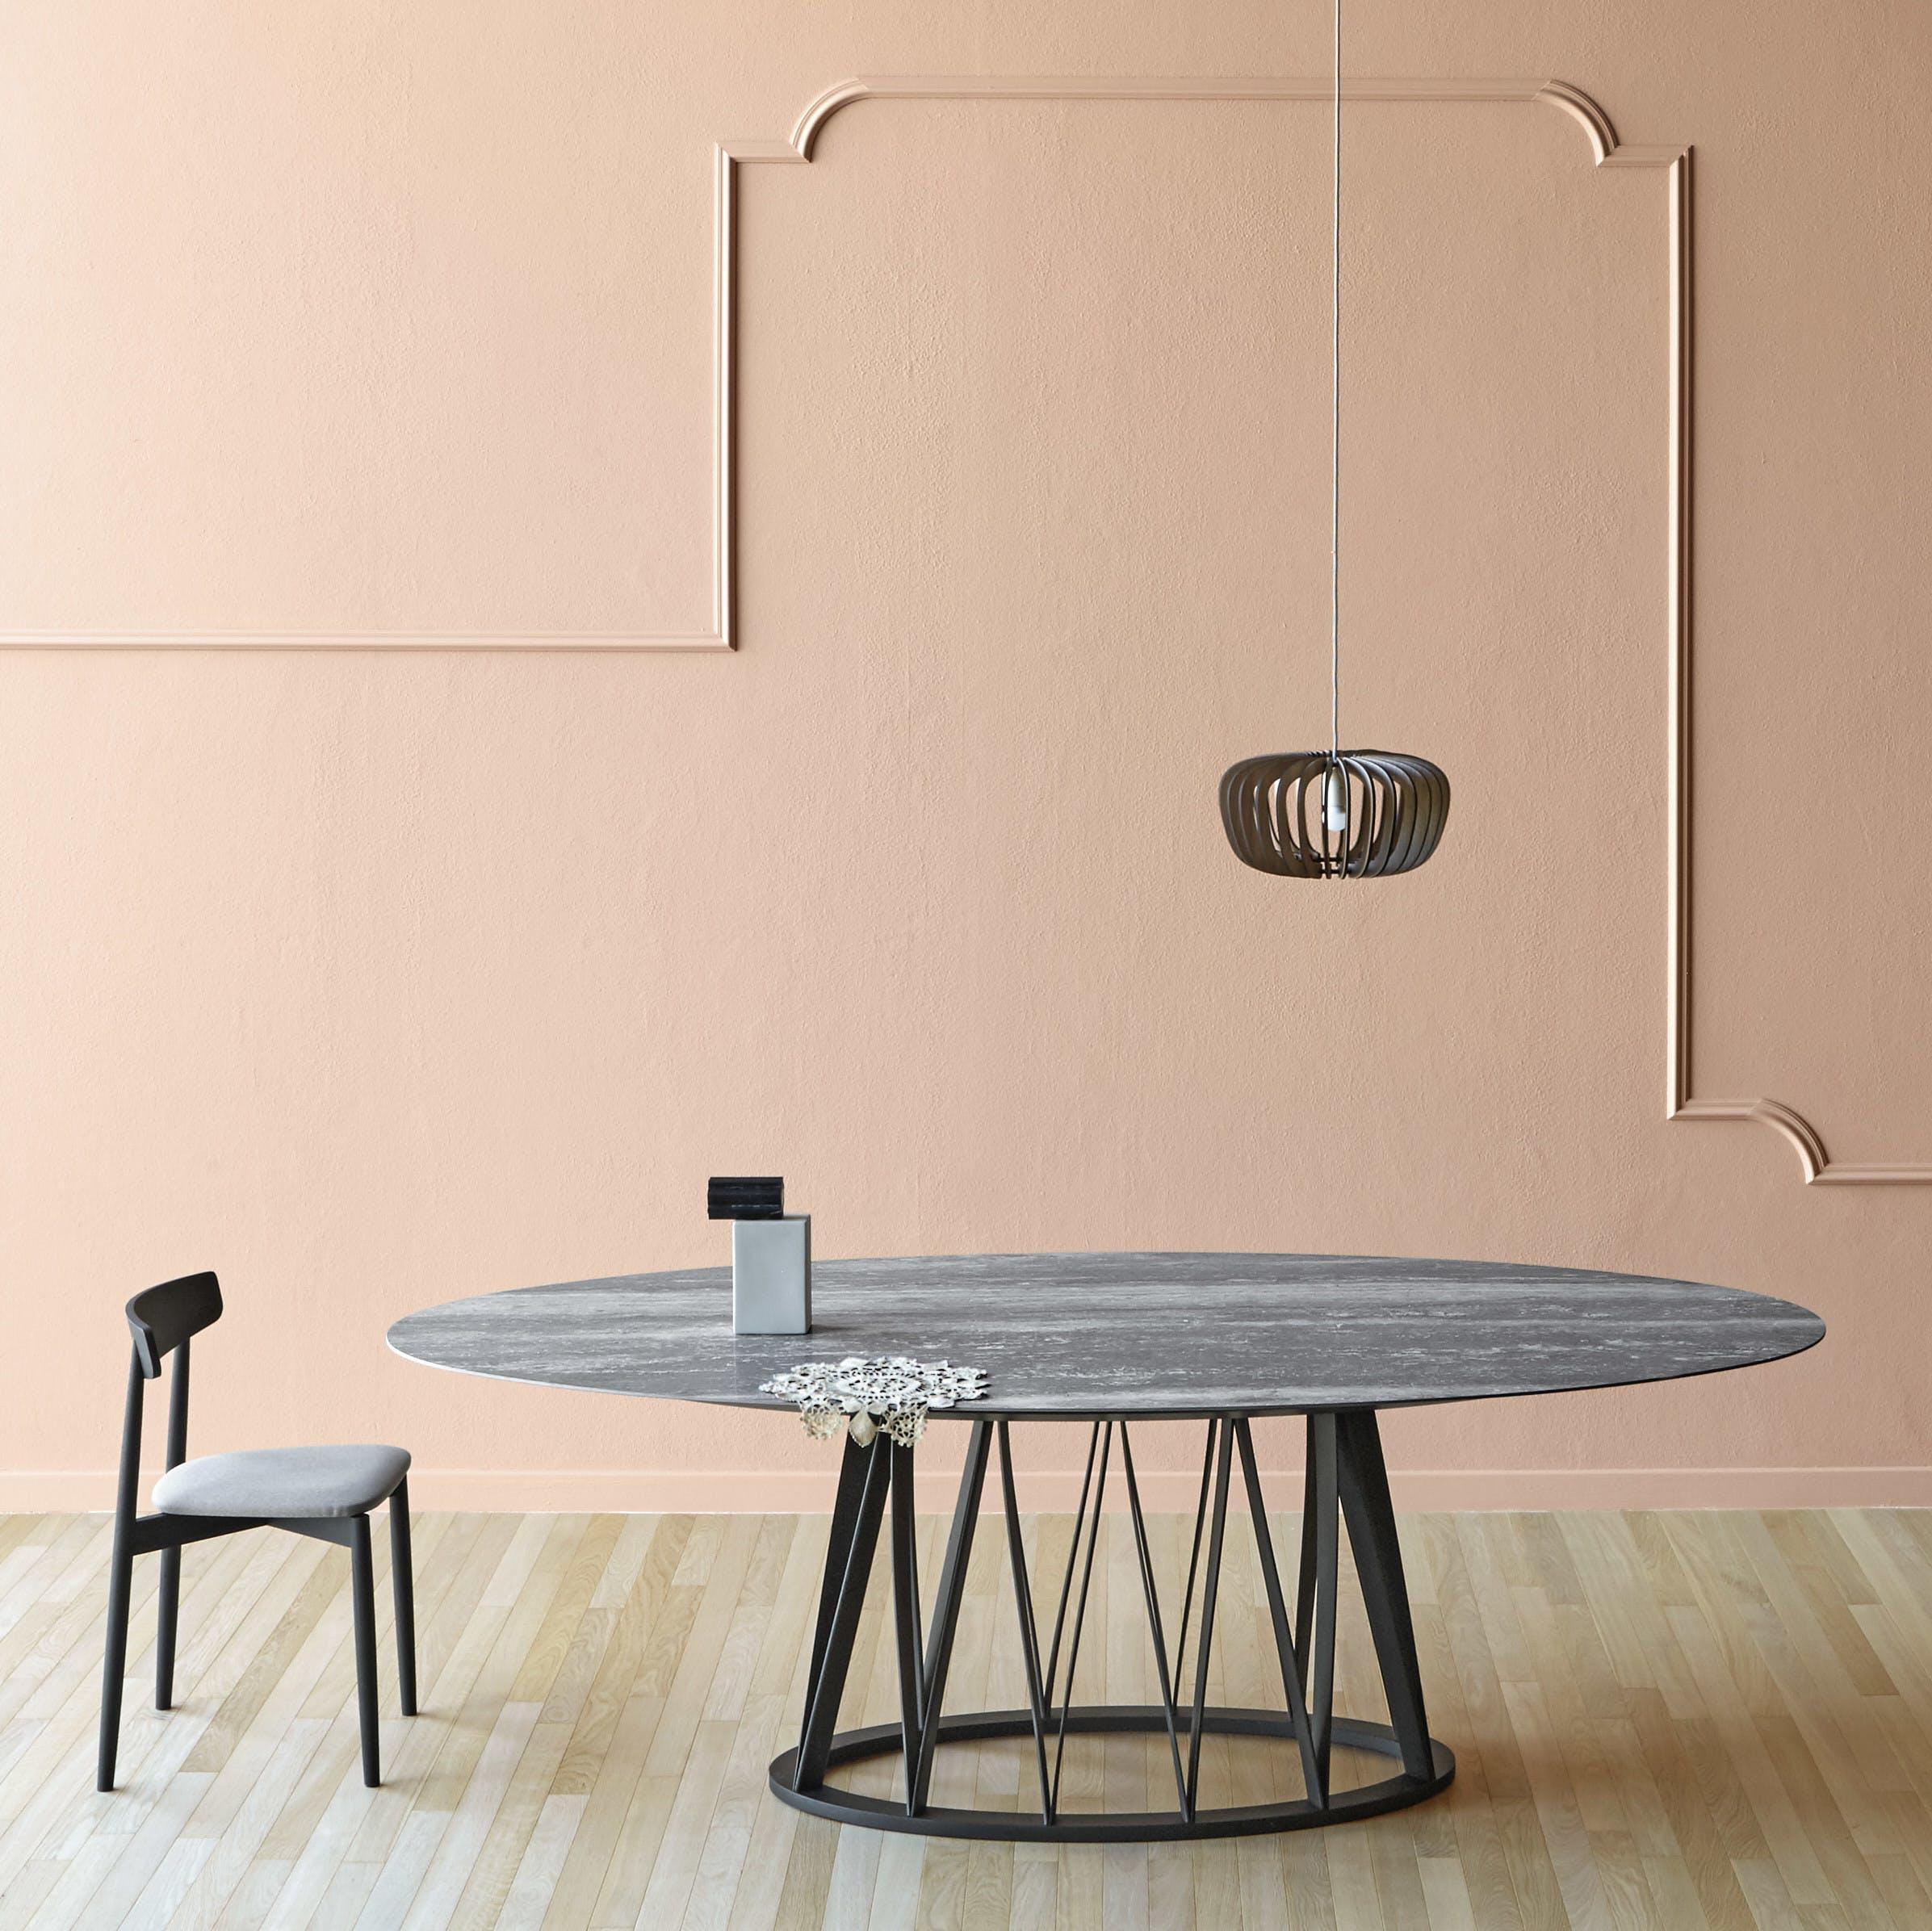 Miniforms Acco Table Black Center Haute Living